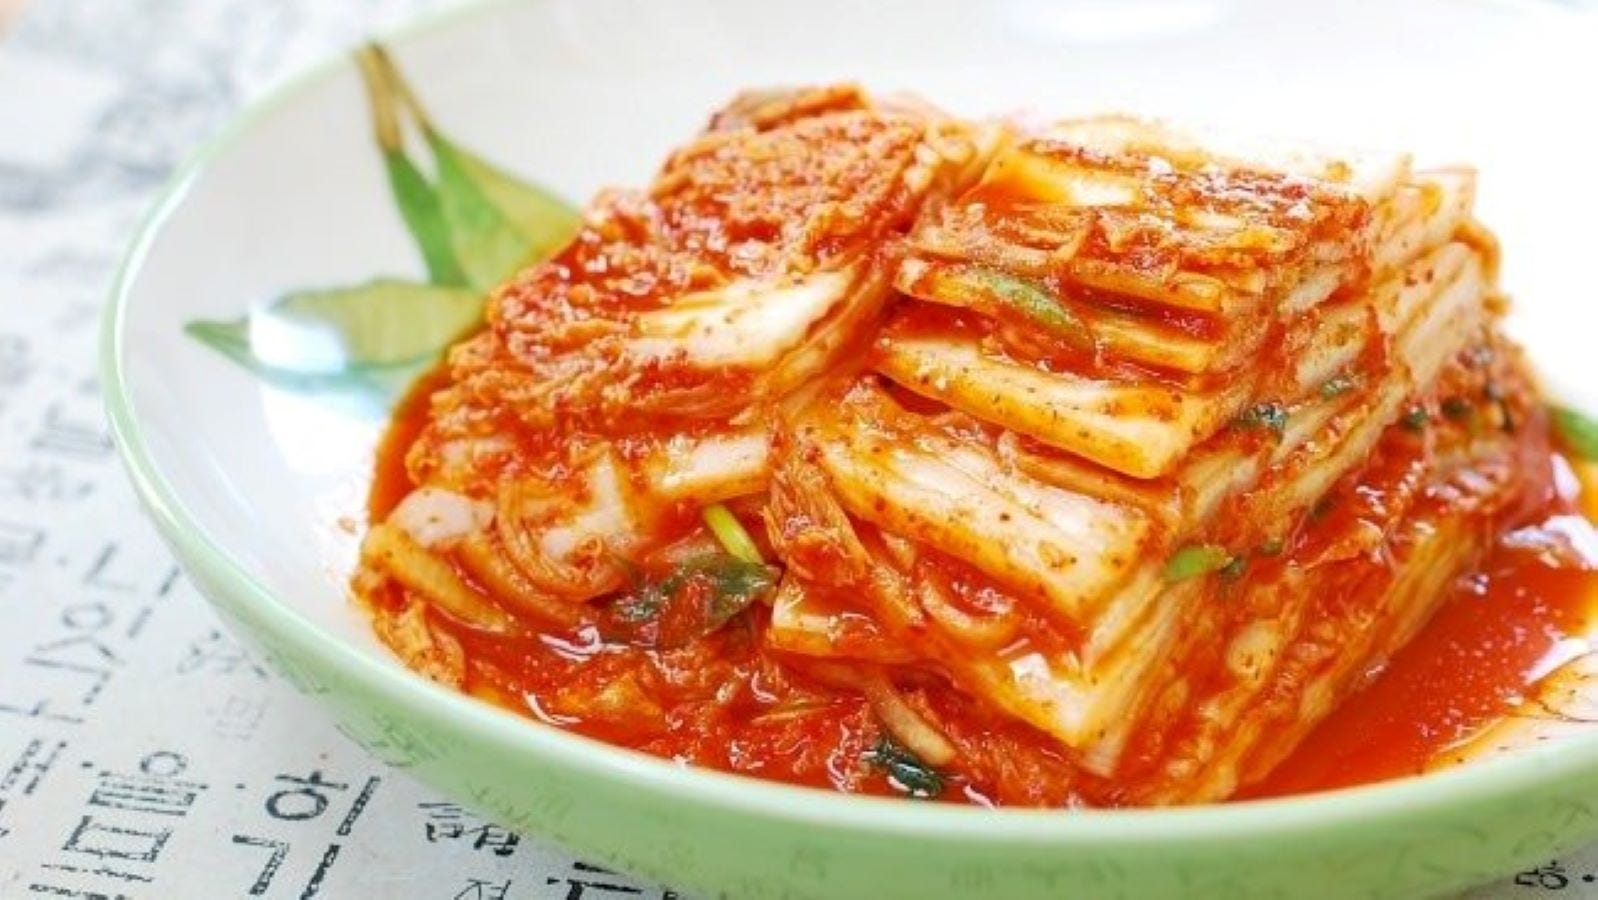 A plate of vegan kimchi.